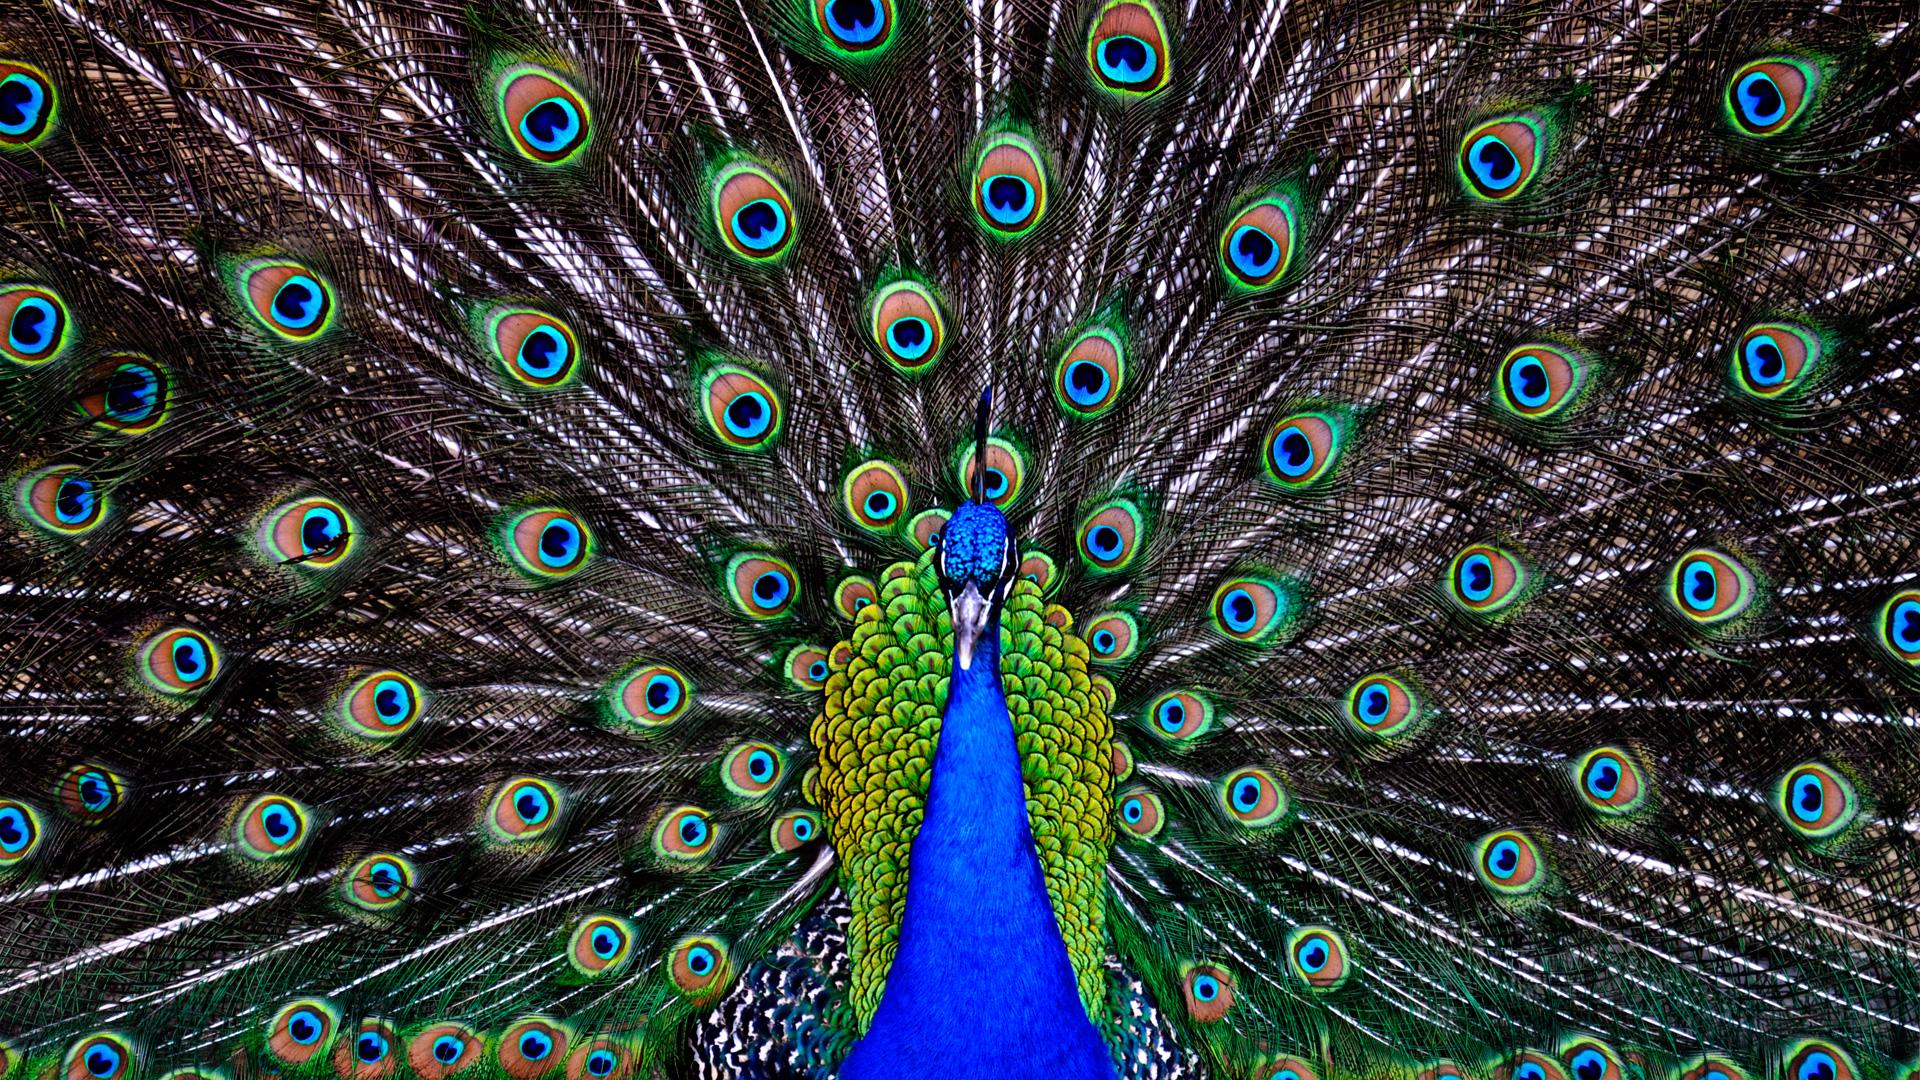 peacock wallpaper 36 wallpaper background hd